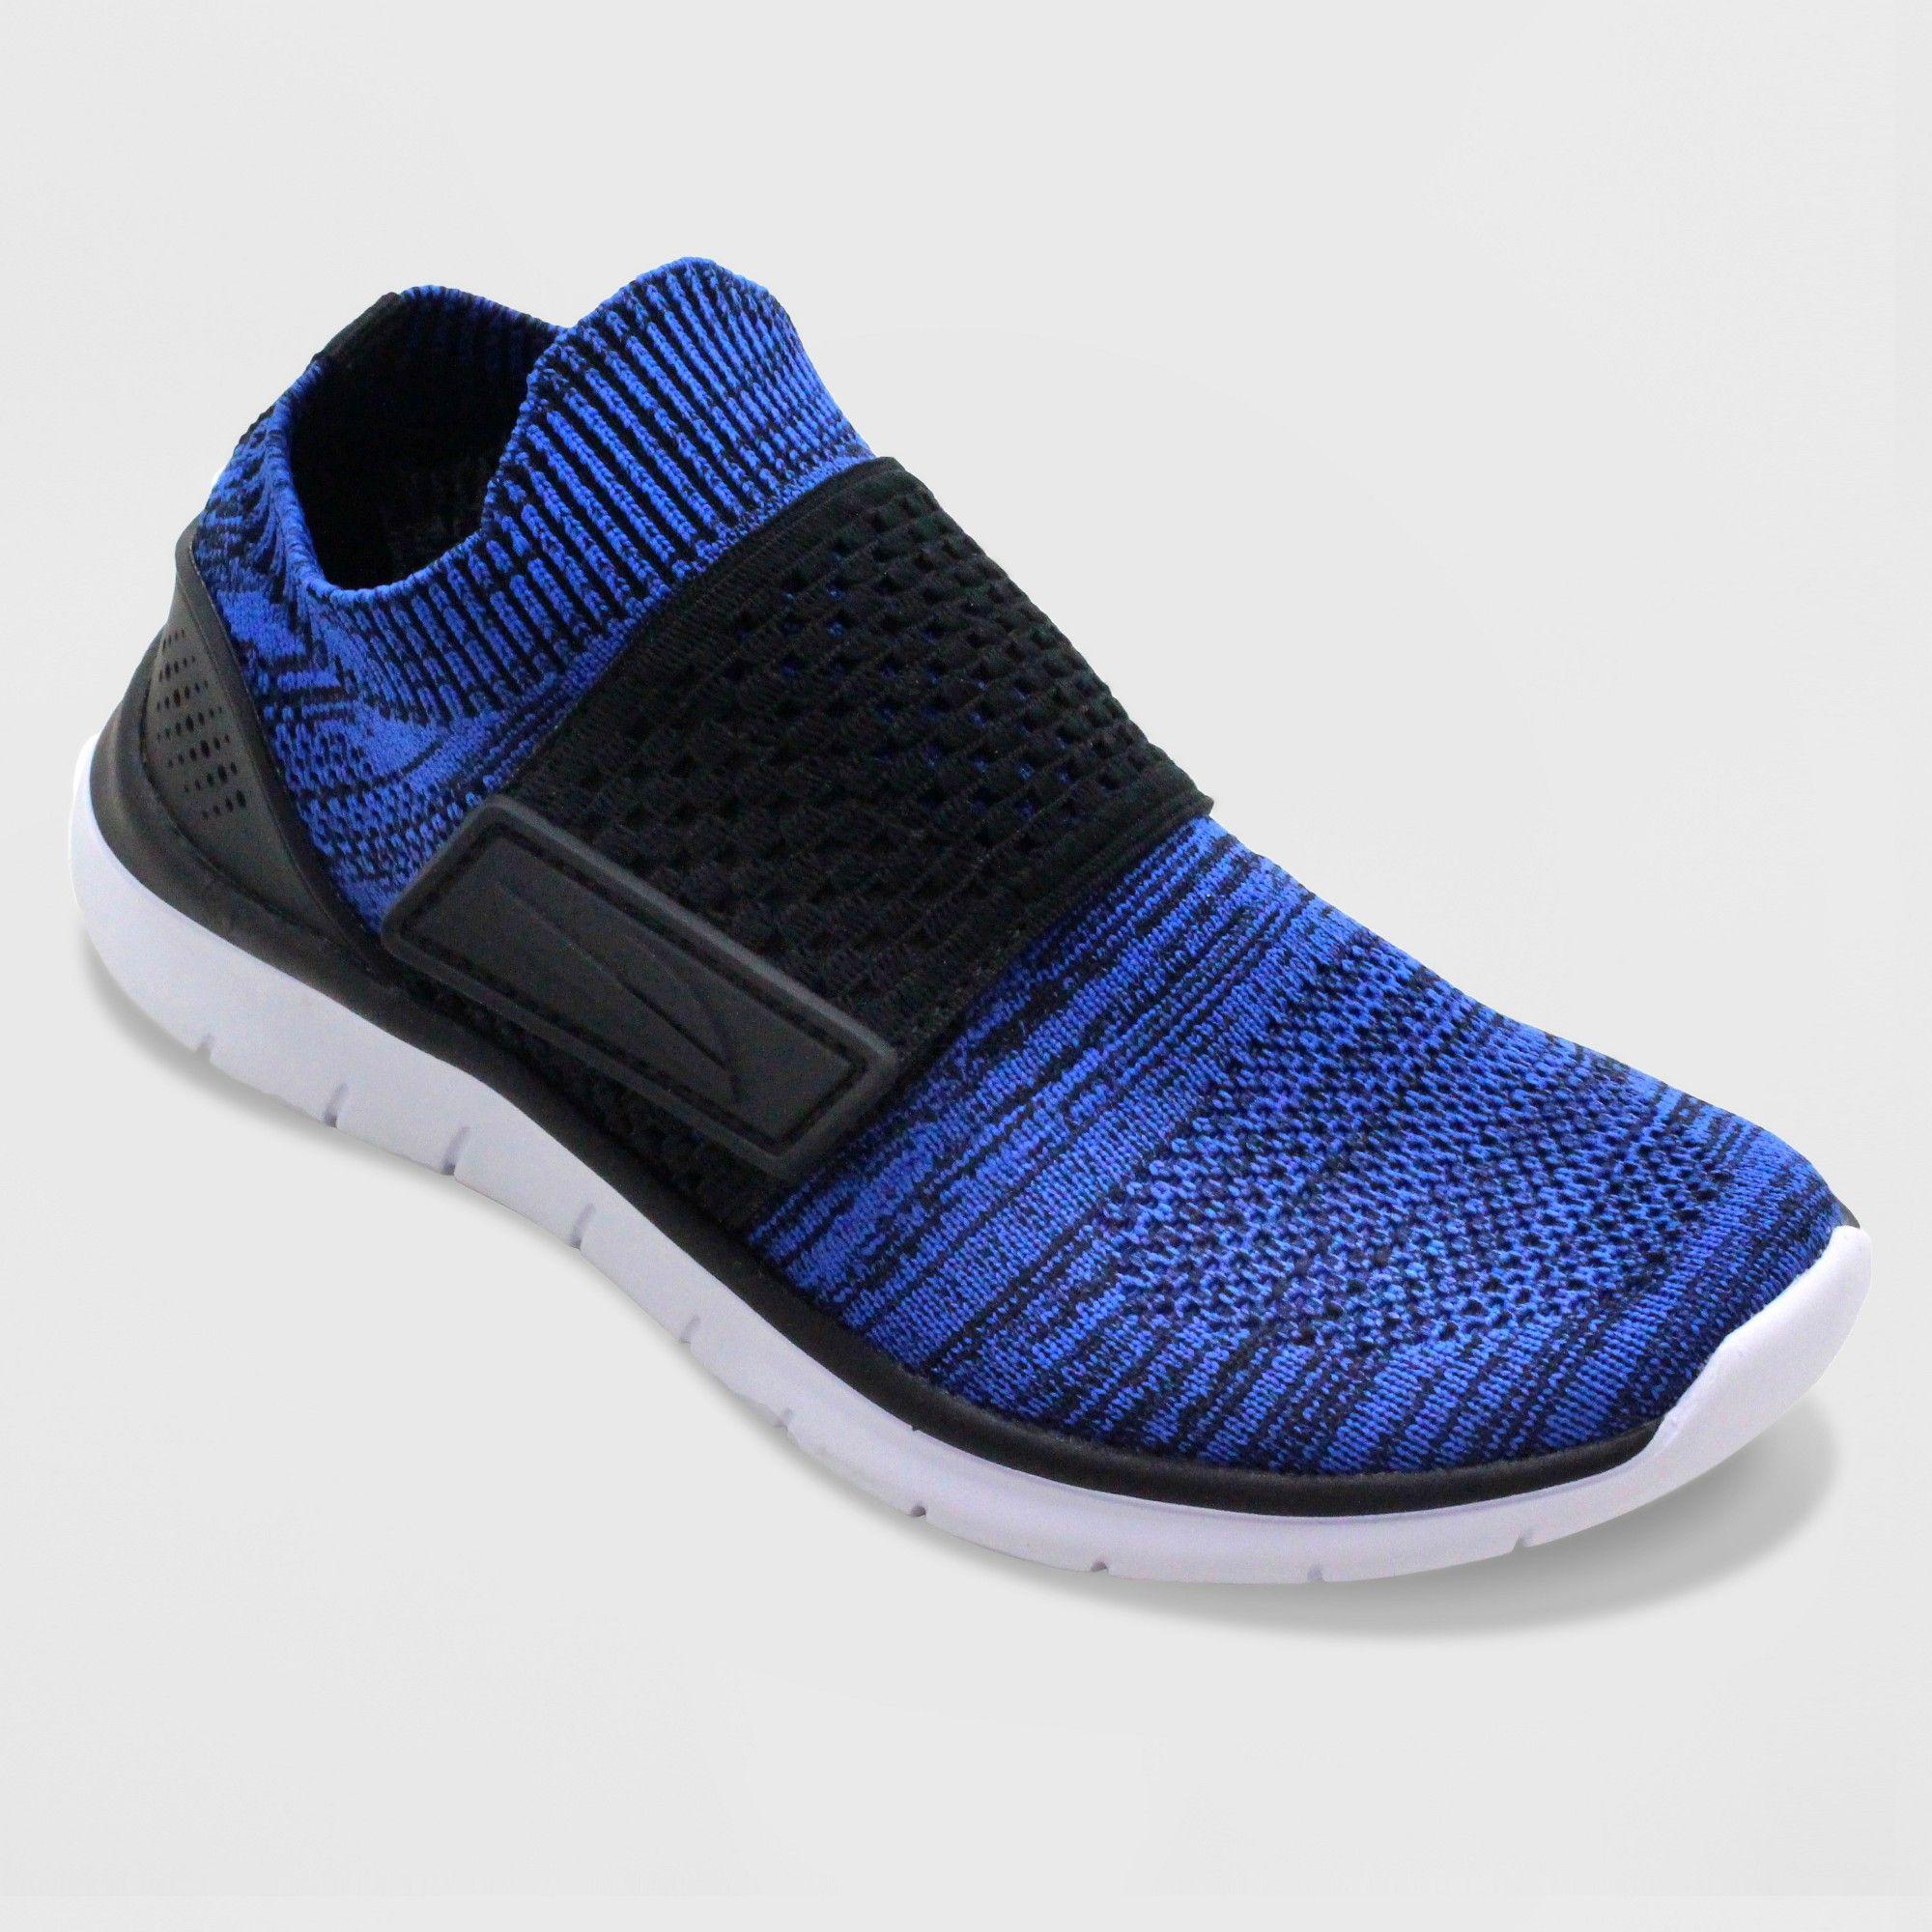 b7332b698 Boys  Endure SK Slip On Performance Athletic Shoes - C9 Champion Blue 13